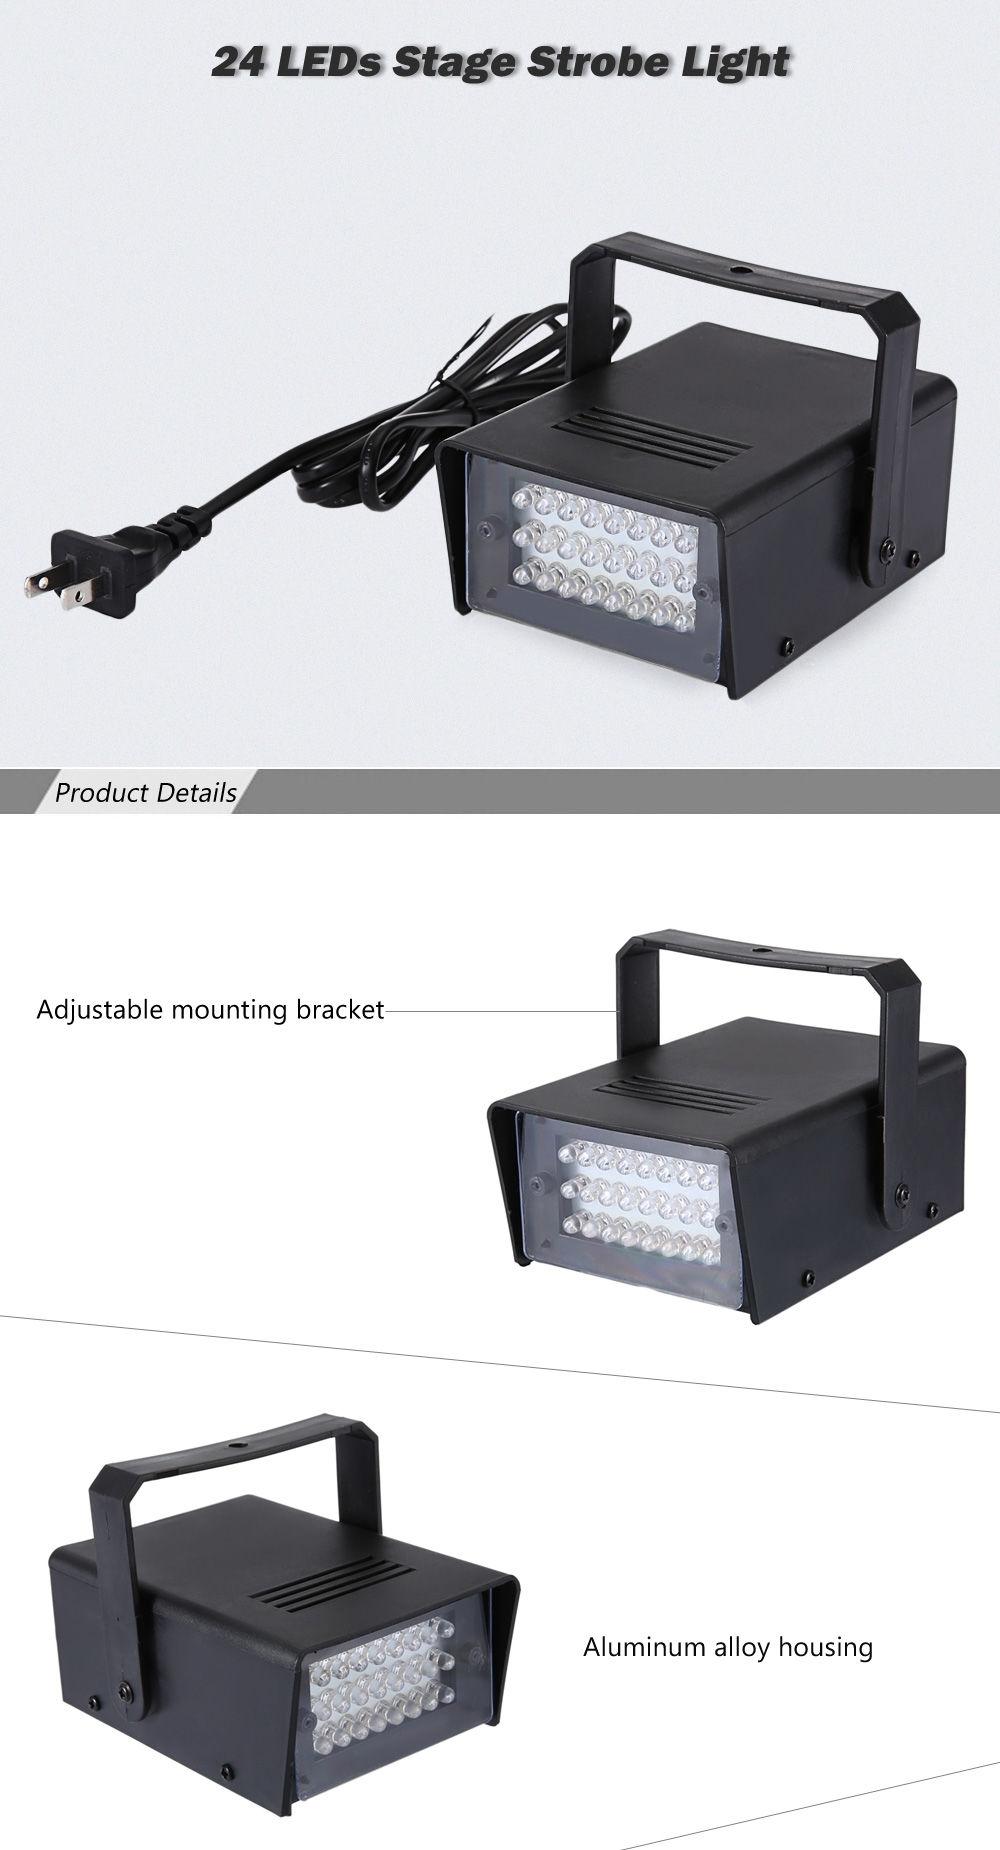 Buy Generic Mini Ac 90 240v 3w 24 Leds Stage Strobe Light Best Adjustable 20160815152630 97442 40555